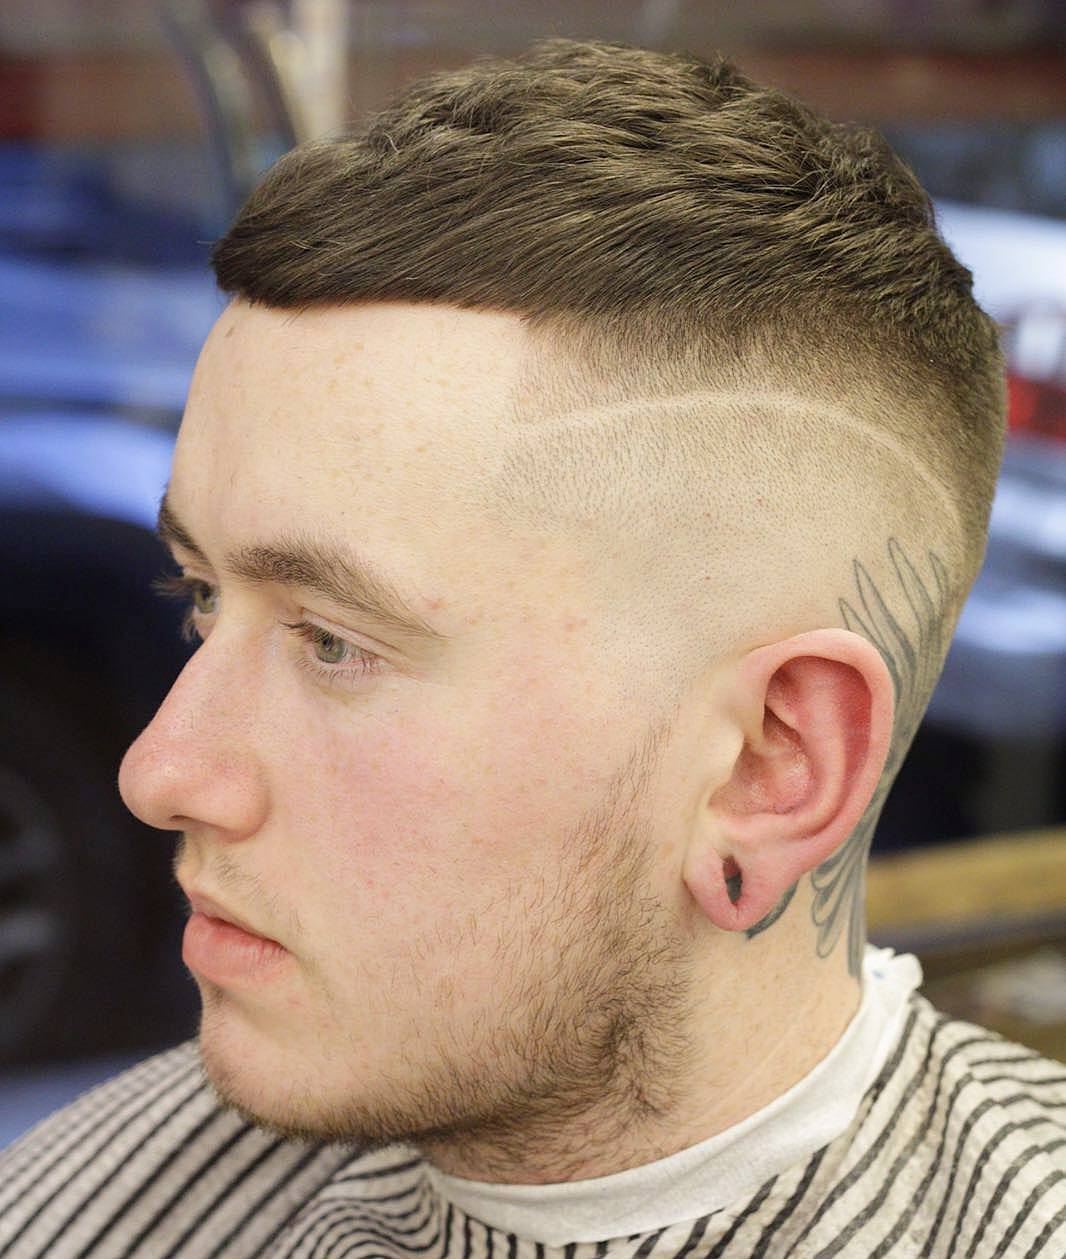 Miraculous 20 Very Short Haircuts For Men Short Hairstyles For Black Women Fulllsitofus